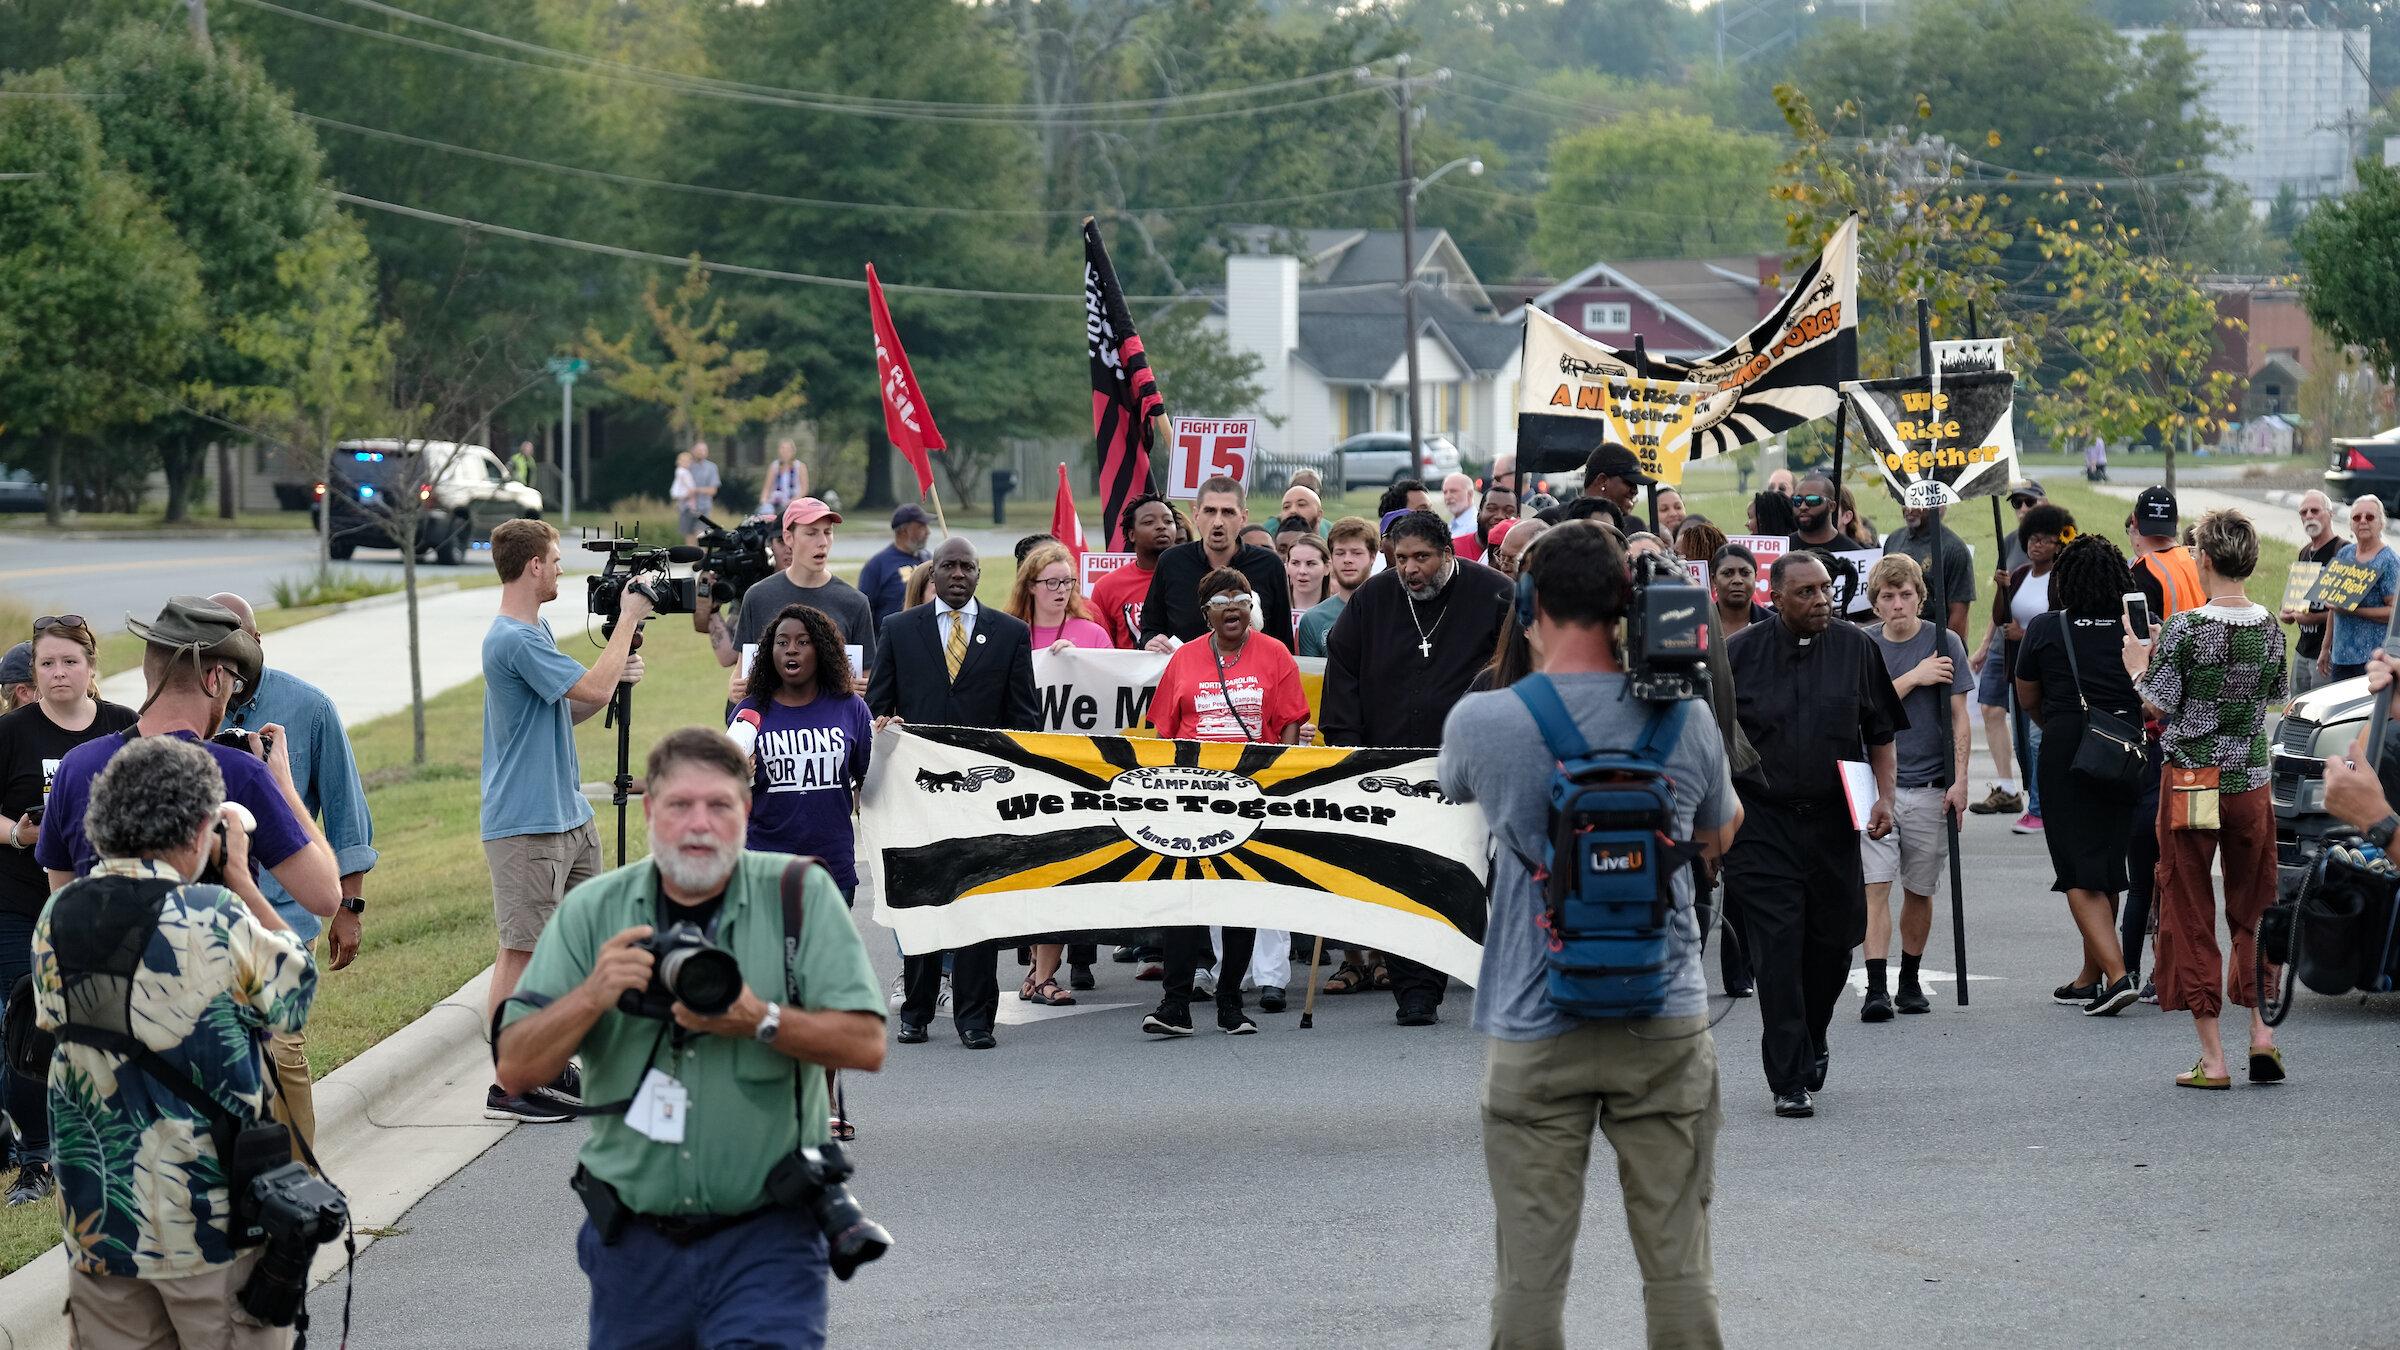 2019 0930 NC Greensboro MORE march by Steve Pavey HopeinFocus-46.jpg